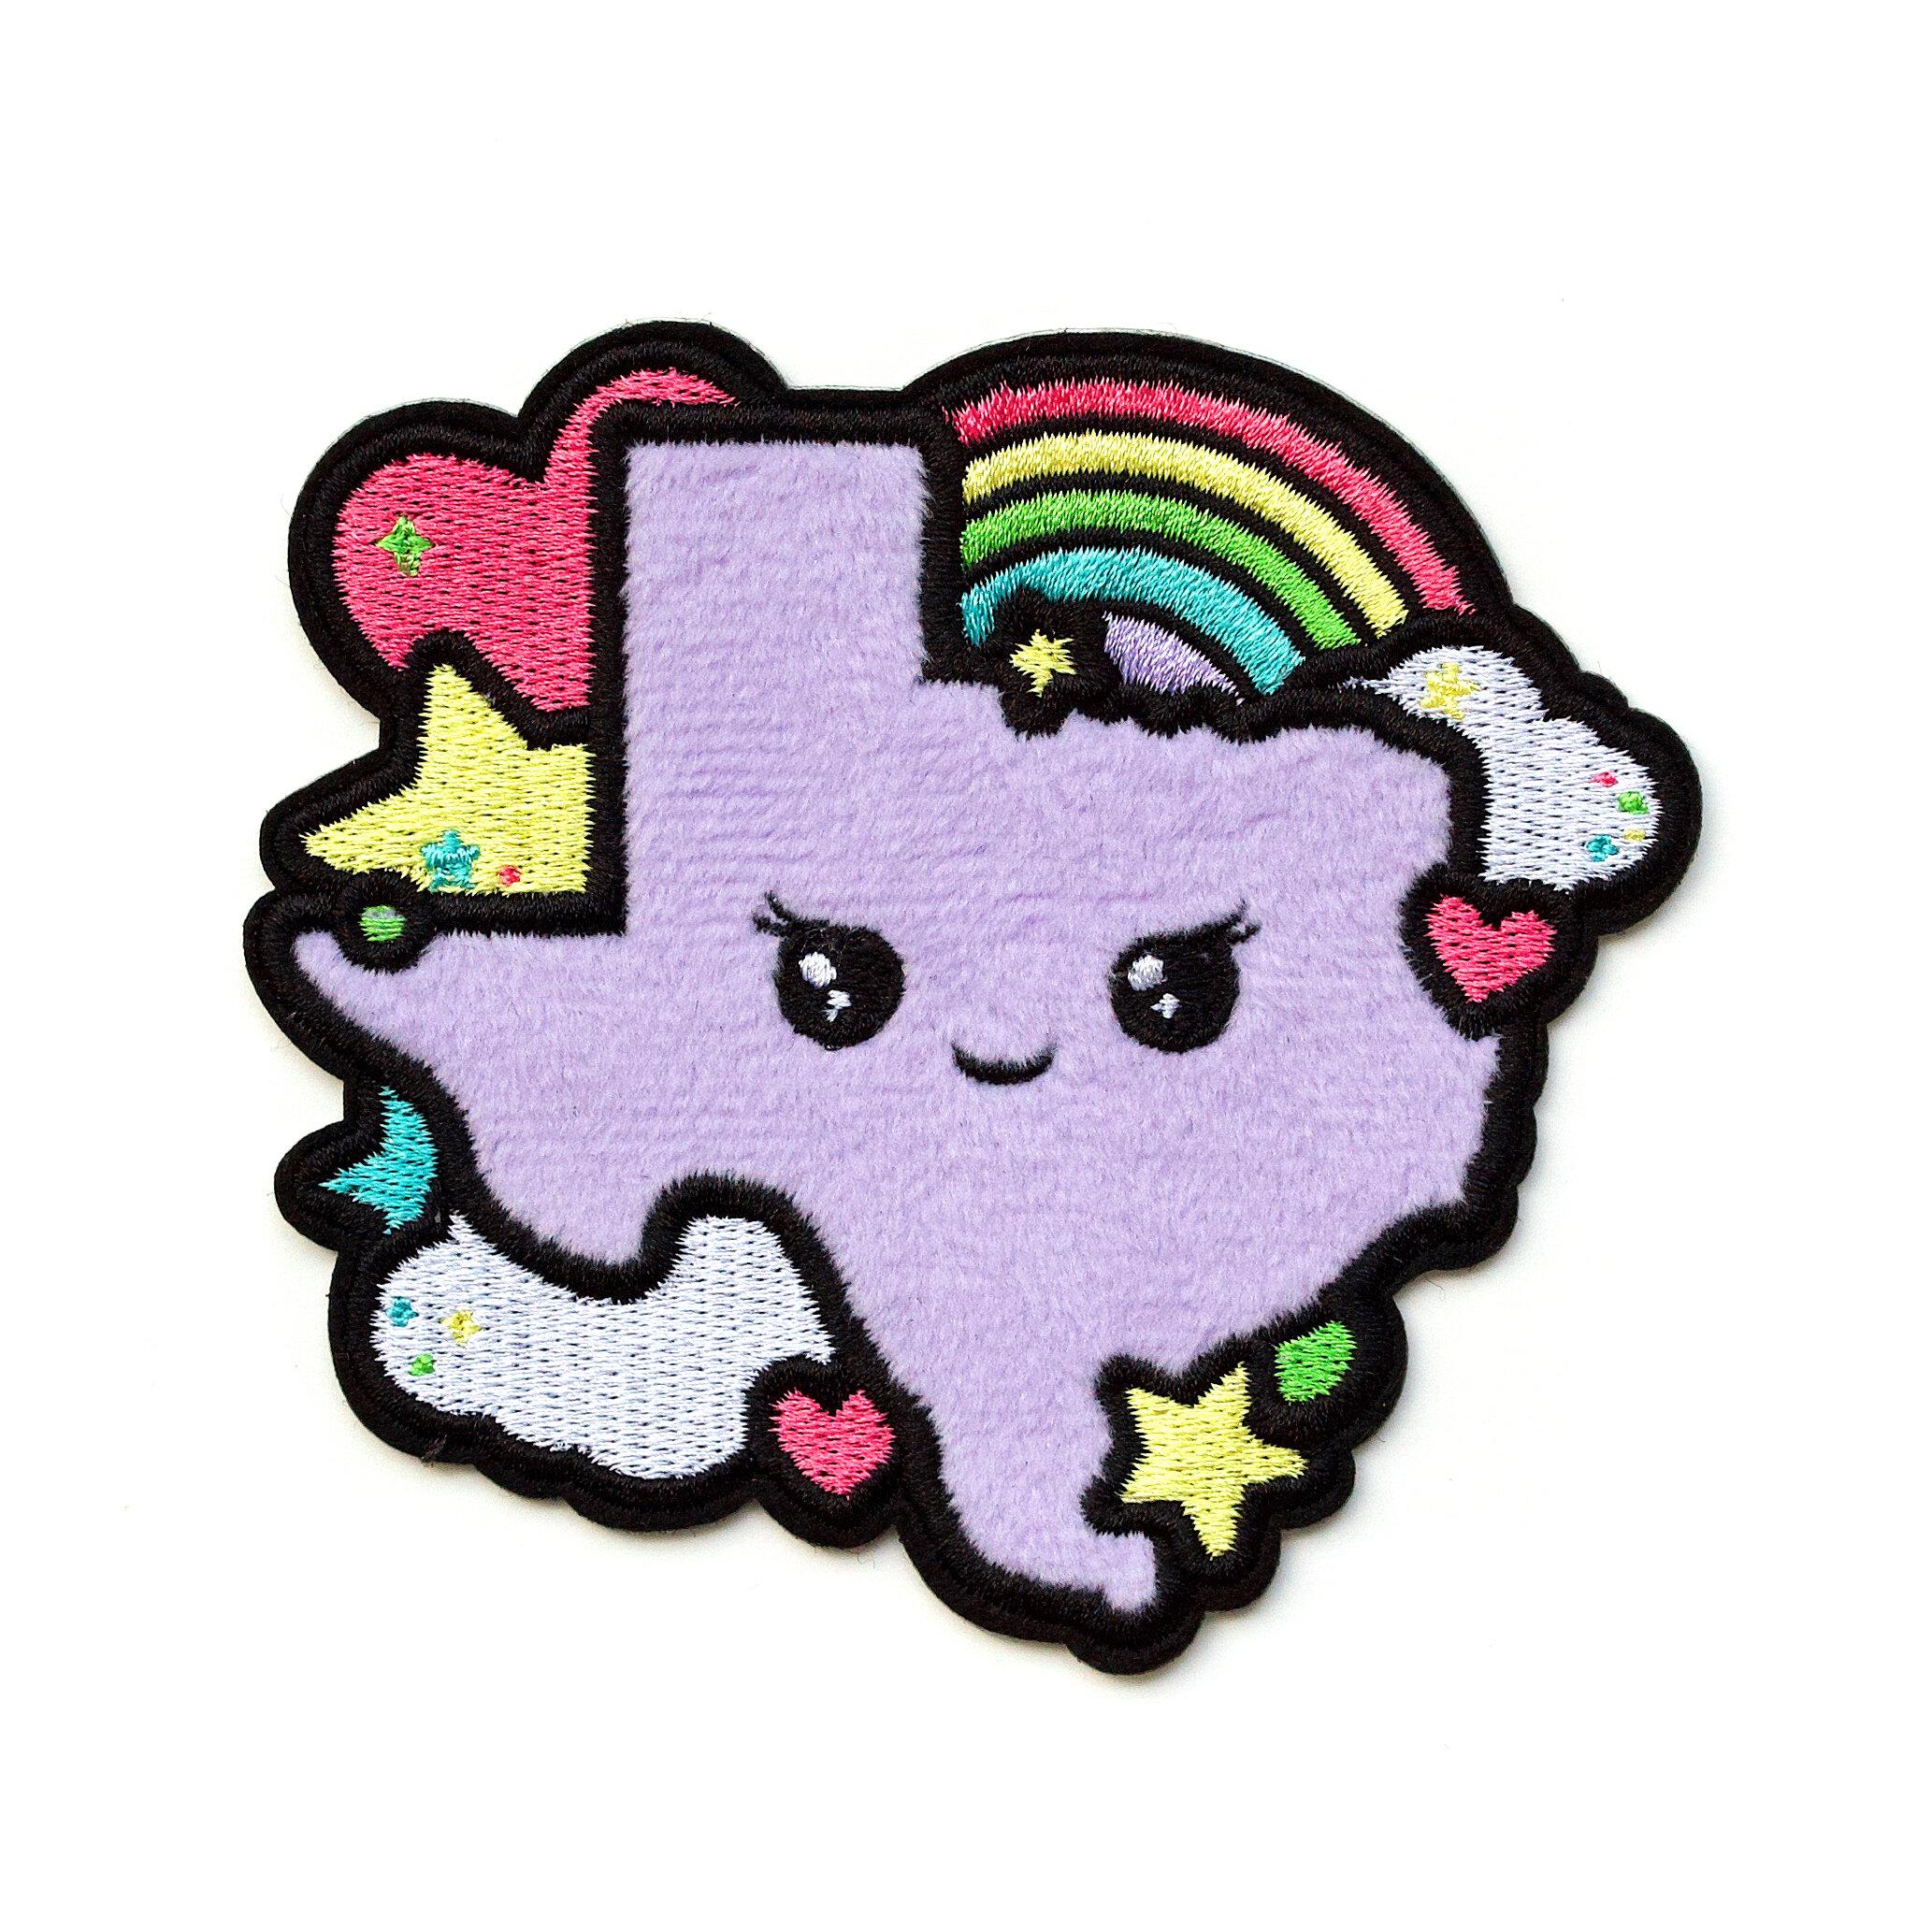 A12 - Texas Cutie Patch